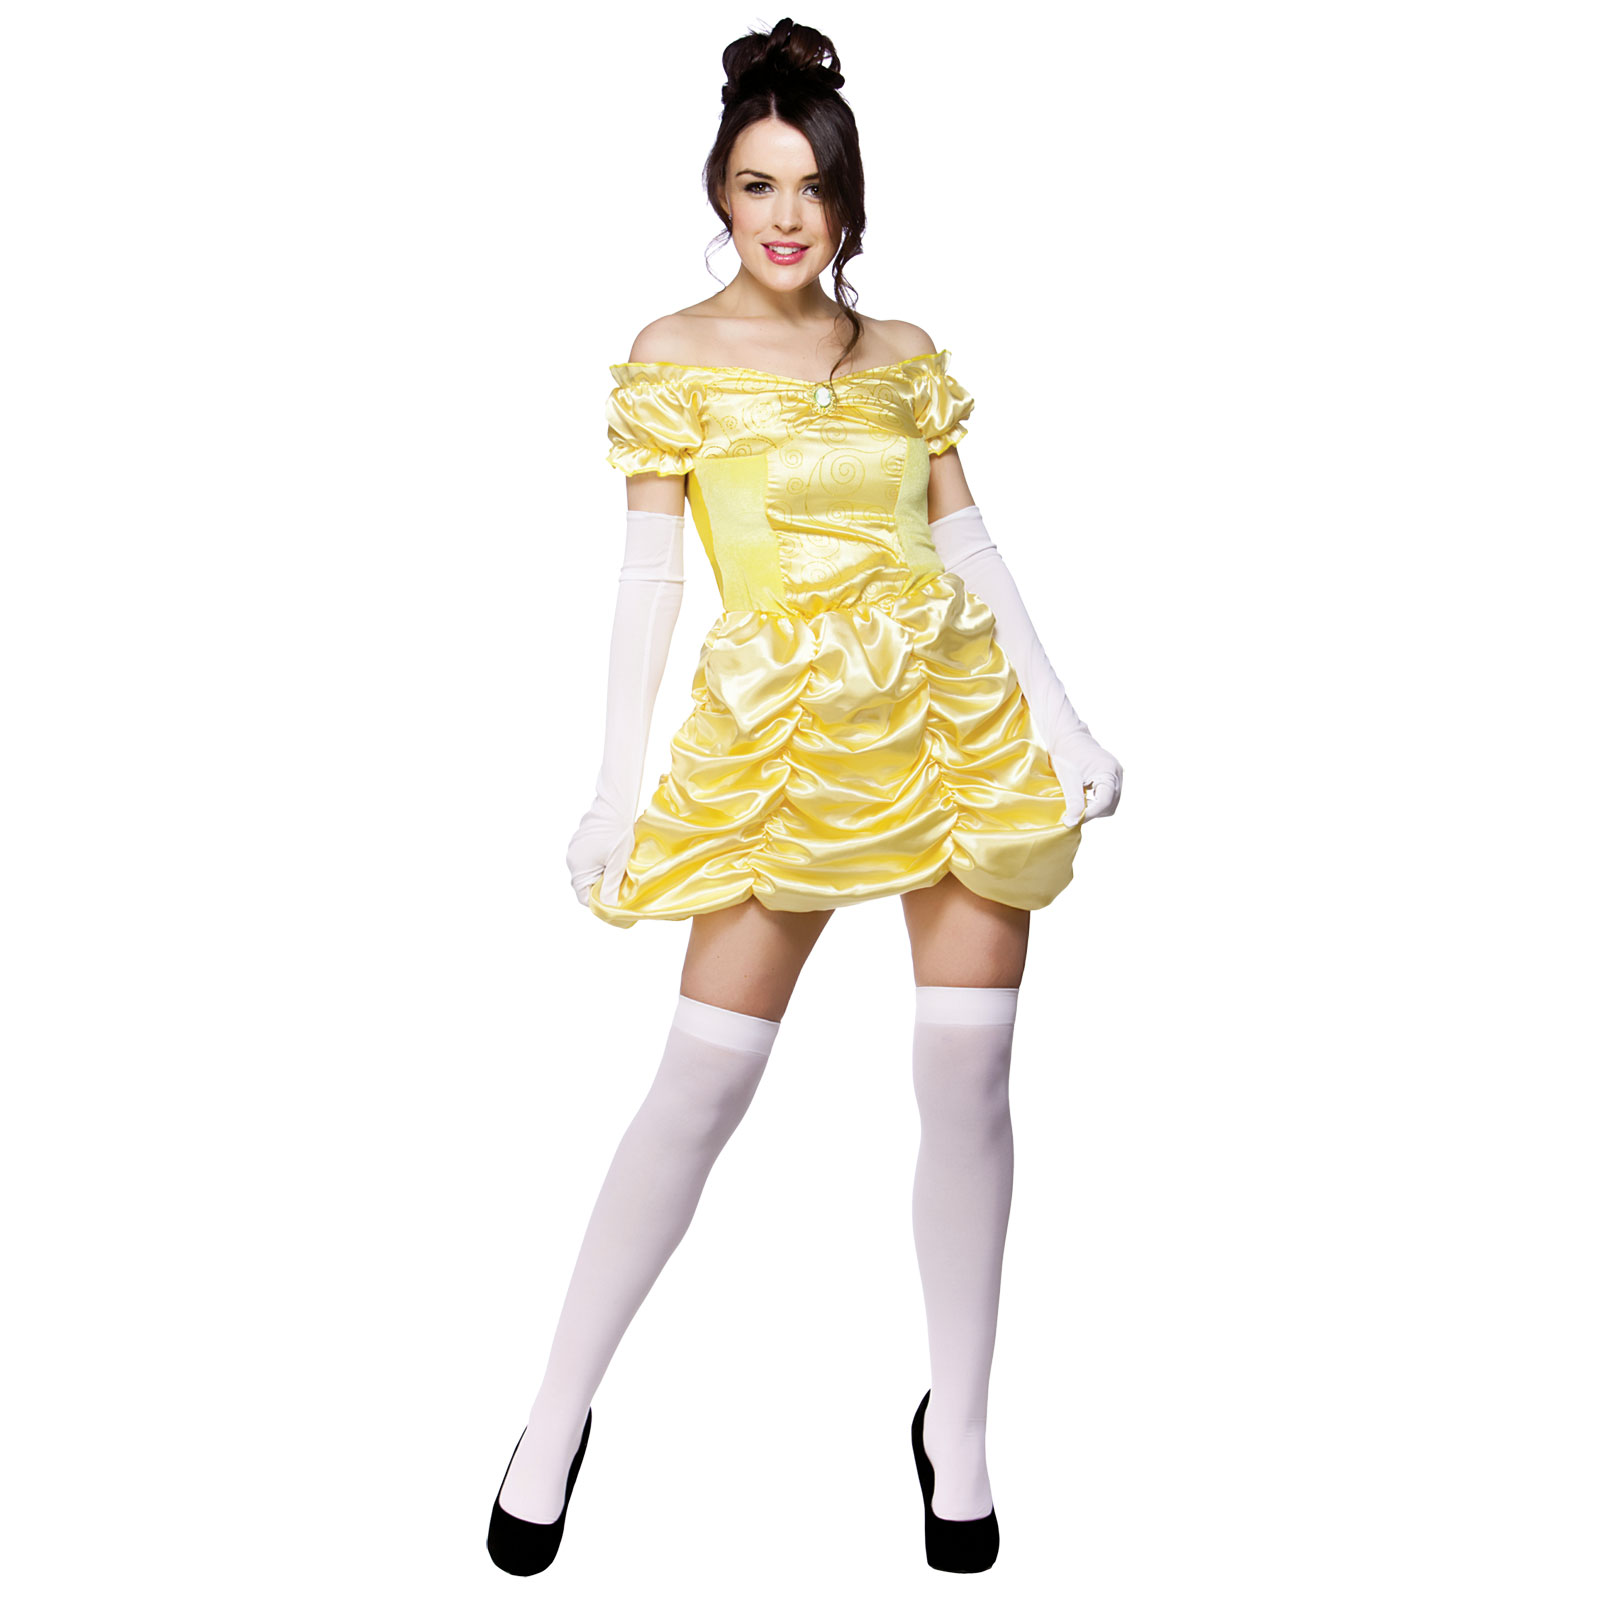 Princess Belle Costume Adult  sc 1 st  Lookup Before Buying & Belle dress adult - Lookup BeforeBuying